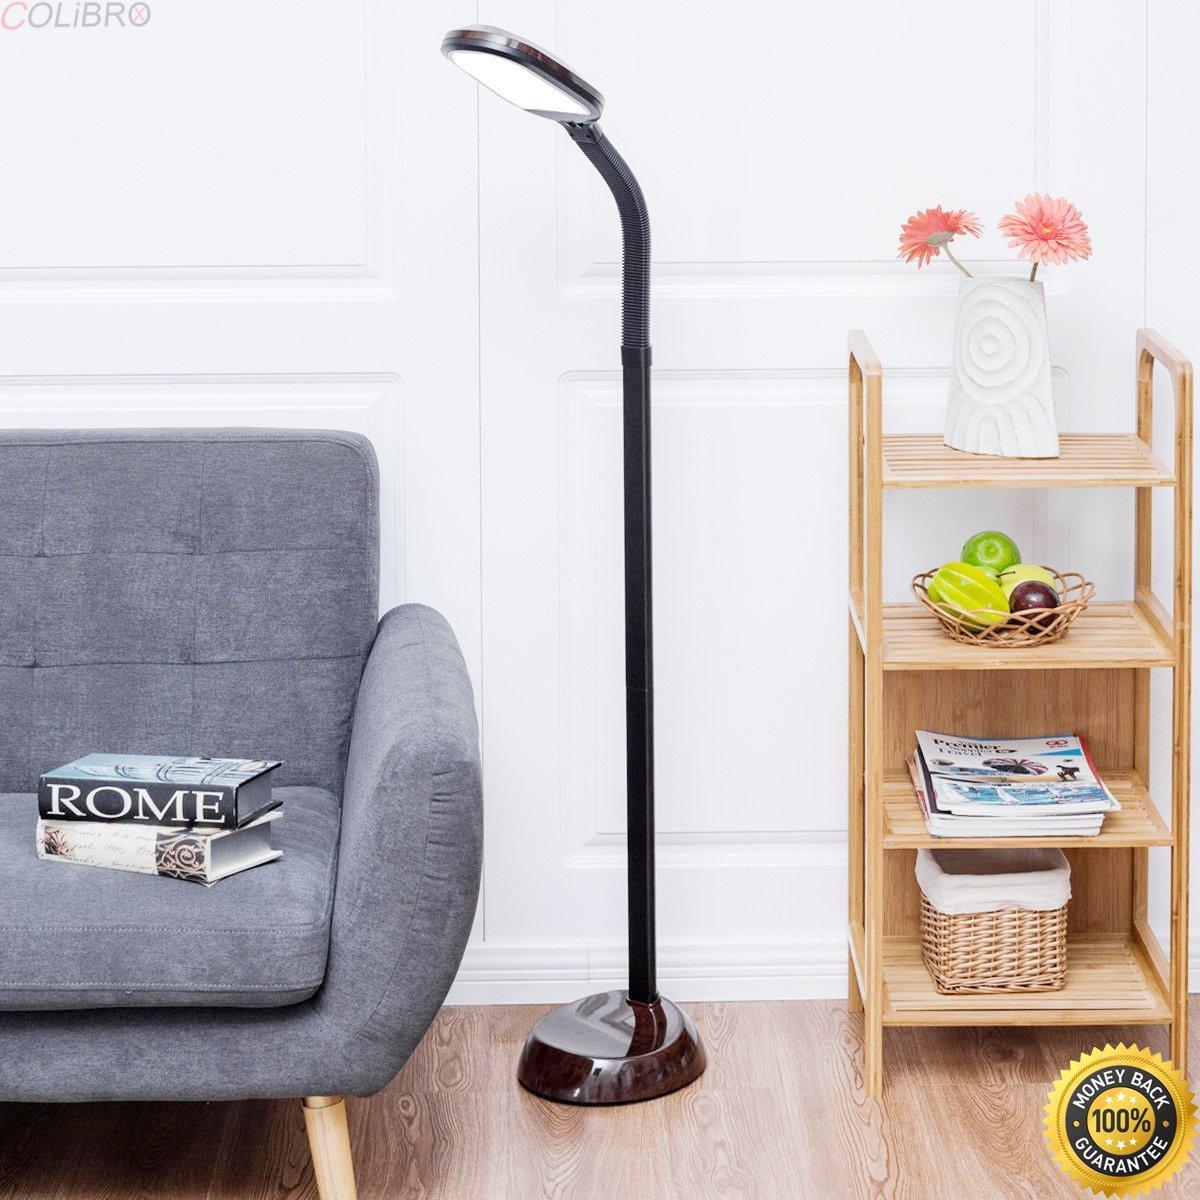 COLIBROX--LED Reading Light Standing Floor Lamp Adjustable Gooseneck Energy Saving Walnut,home depot floor lamps,floor lamps for living room,modern floor lamps,standing lamps,amazon floor lamps sale